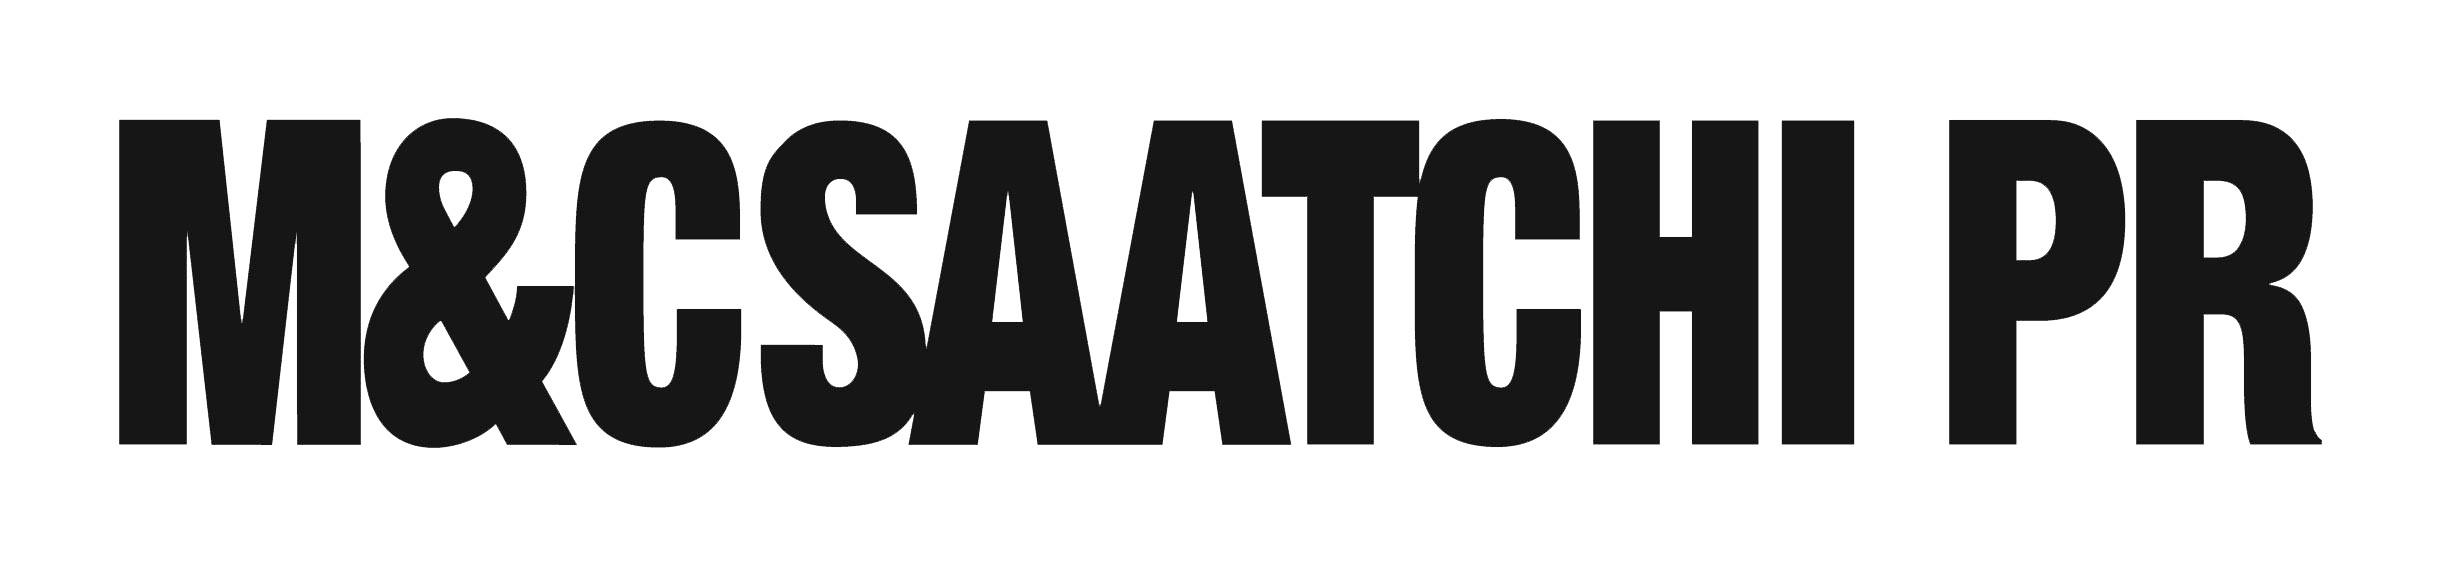 M&C Saatchi PR Appoints U.S. Managing Director | Business Wire